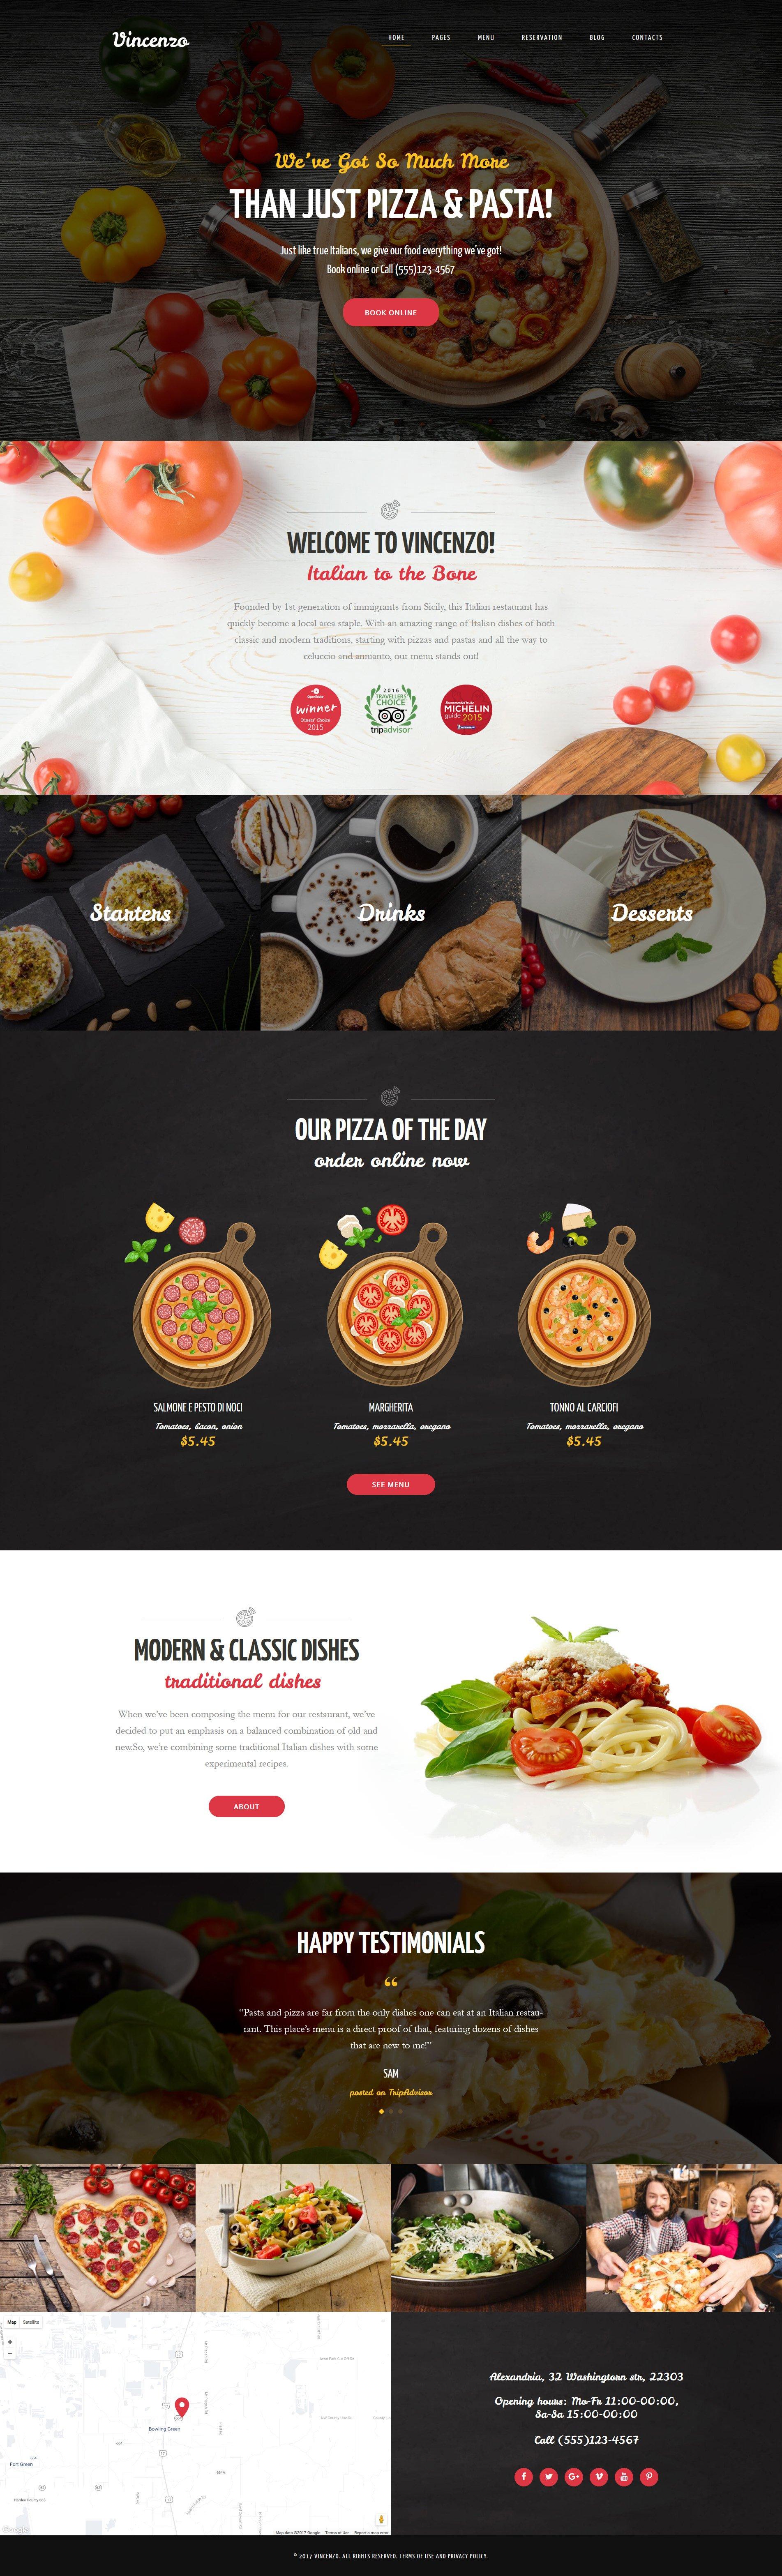 Responsywny motyw WordPress Vincenzo - Delicious Pizza Restaurant Responsive #63633